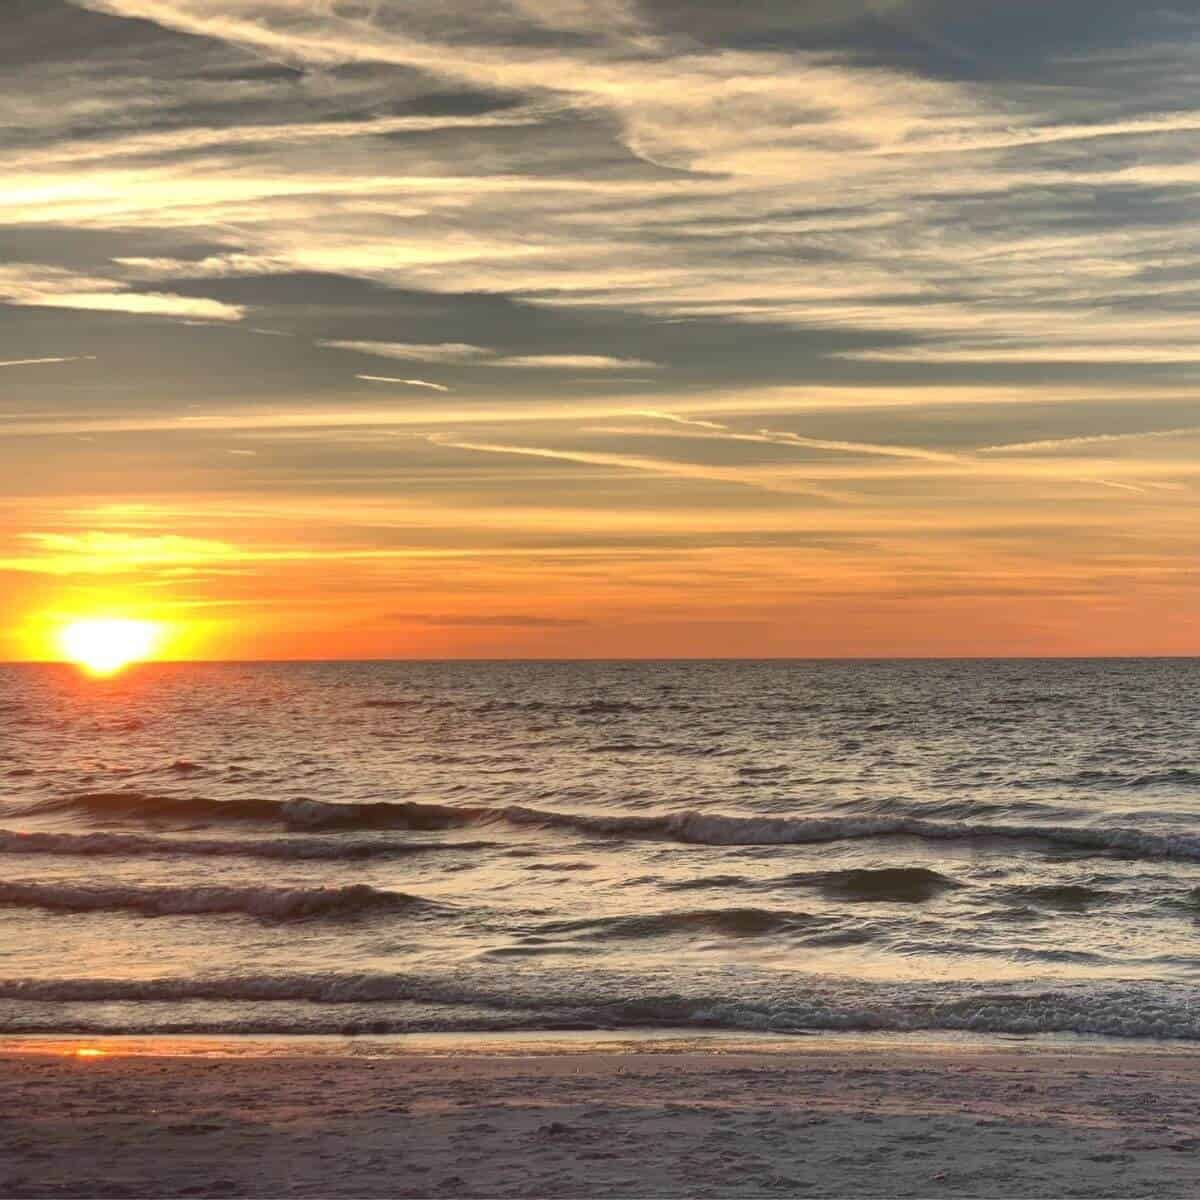 Sunset at St. Pete Beach.